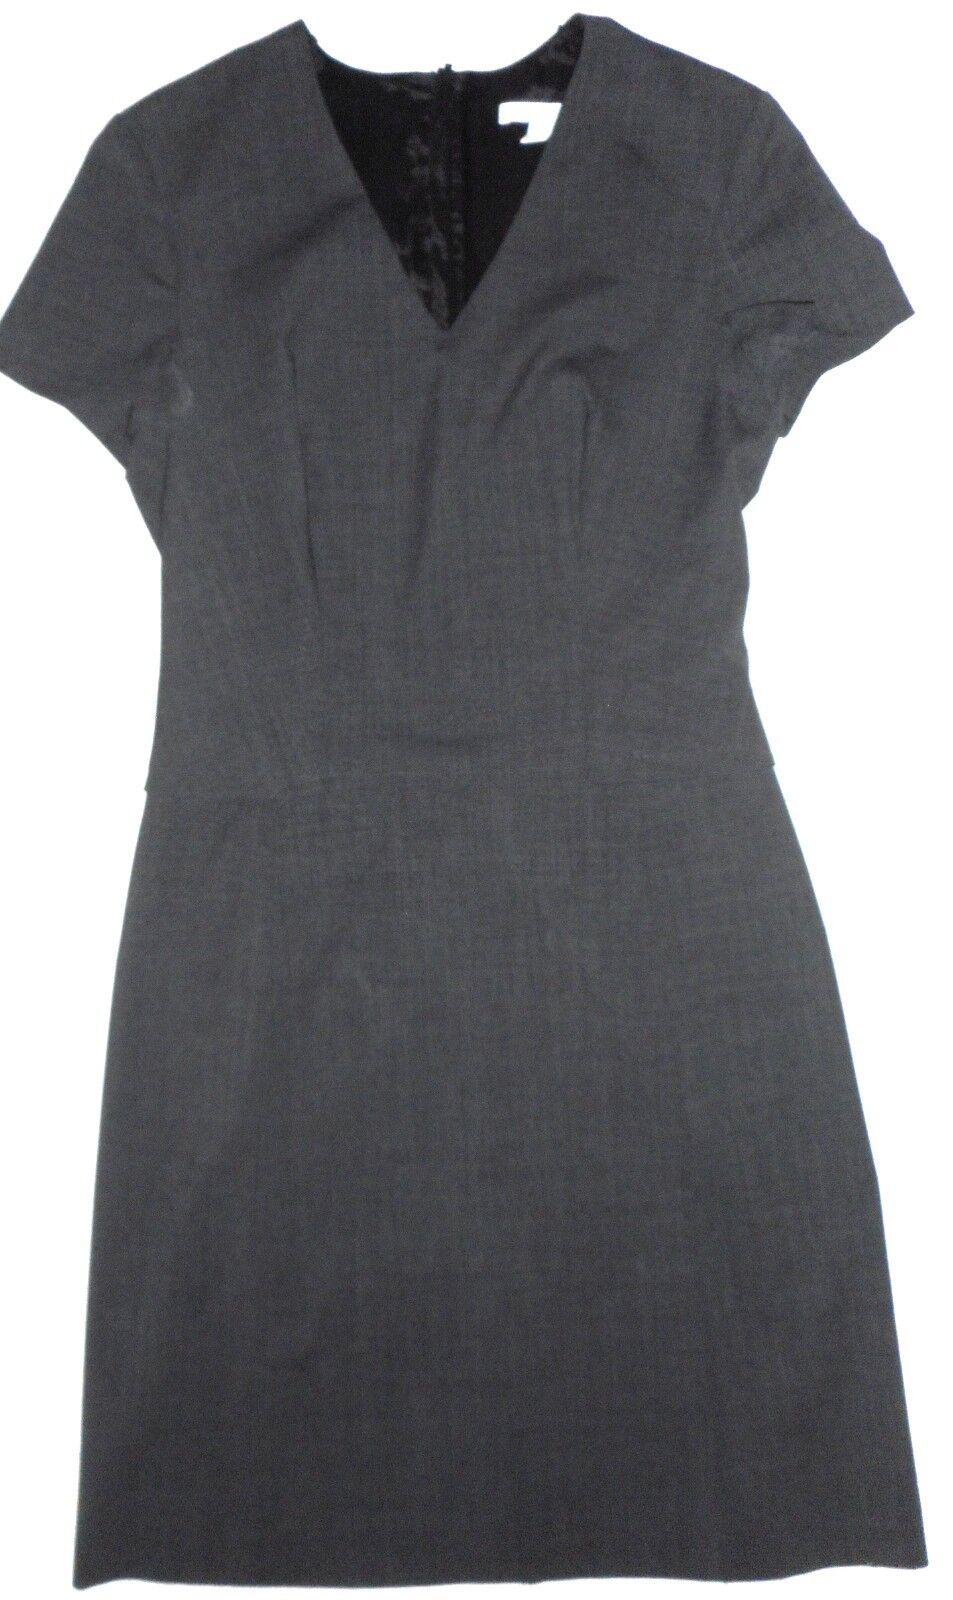 HUGO BOSS Women cap Sleeves Career Dress Grey Virgin Wool Lined flaps, size 4